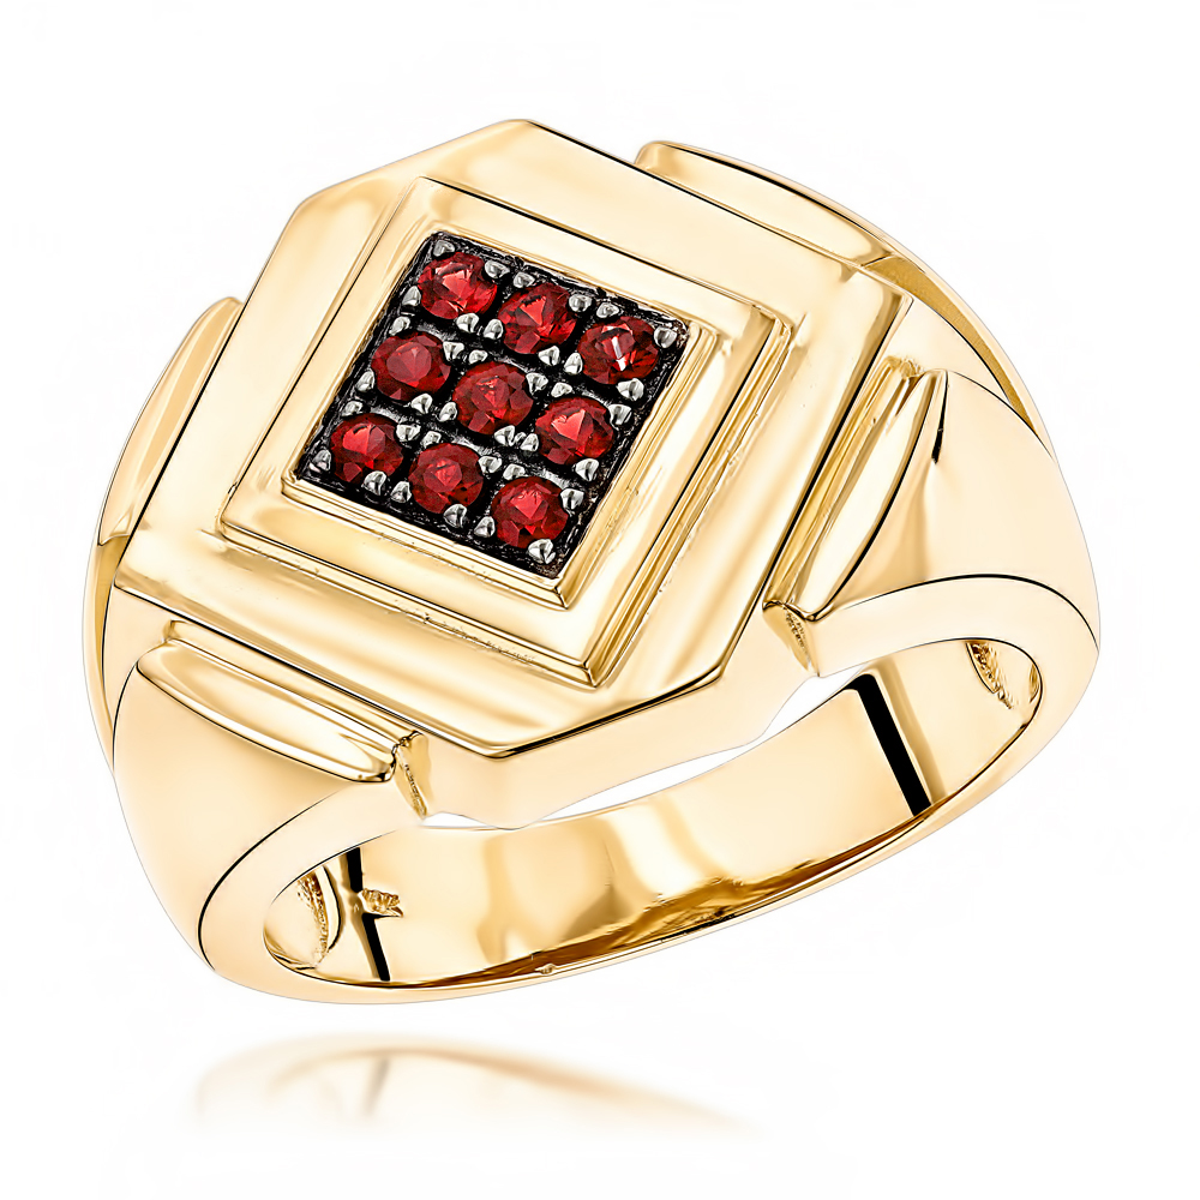 14K Gold Ruby Mens Ring by Luxurman